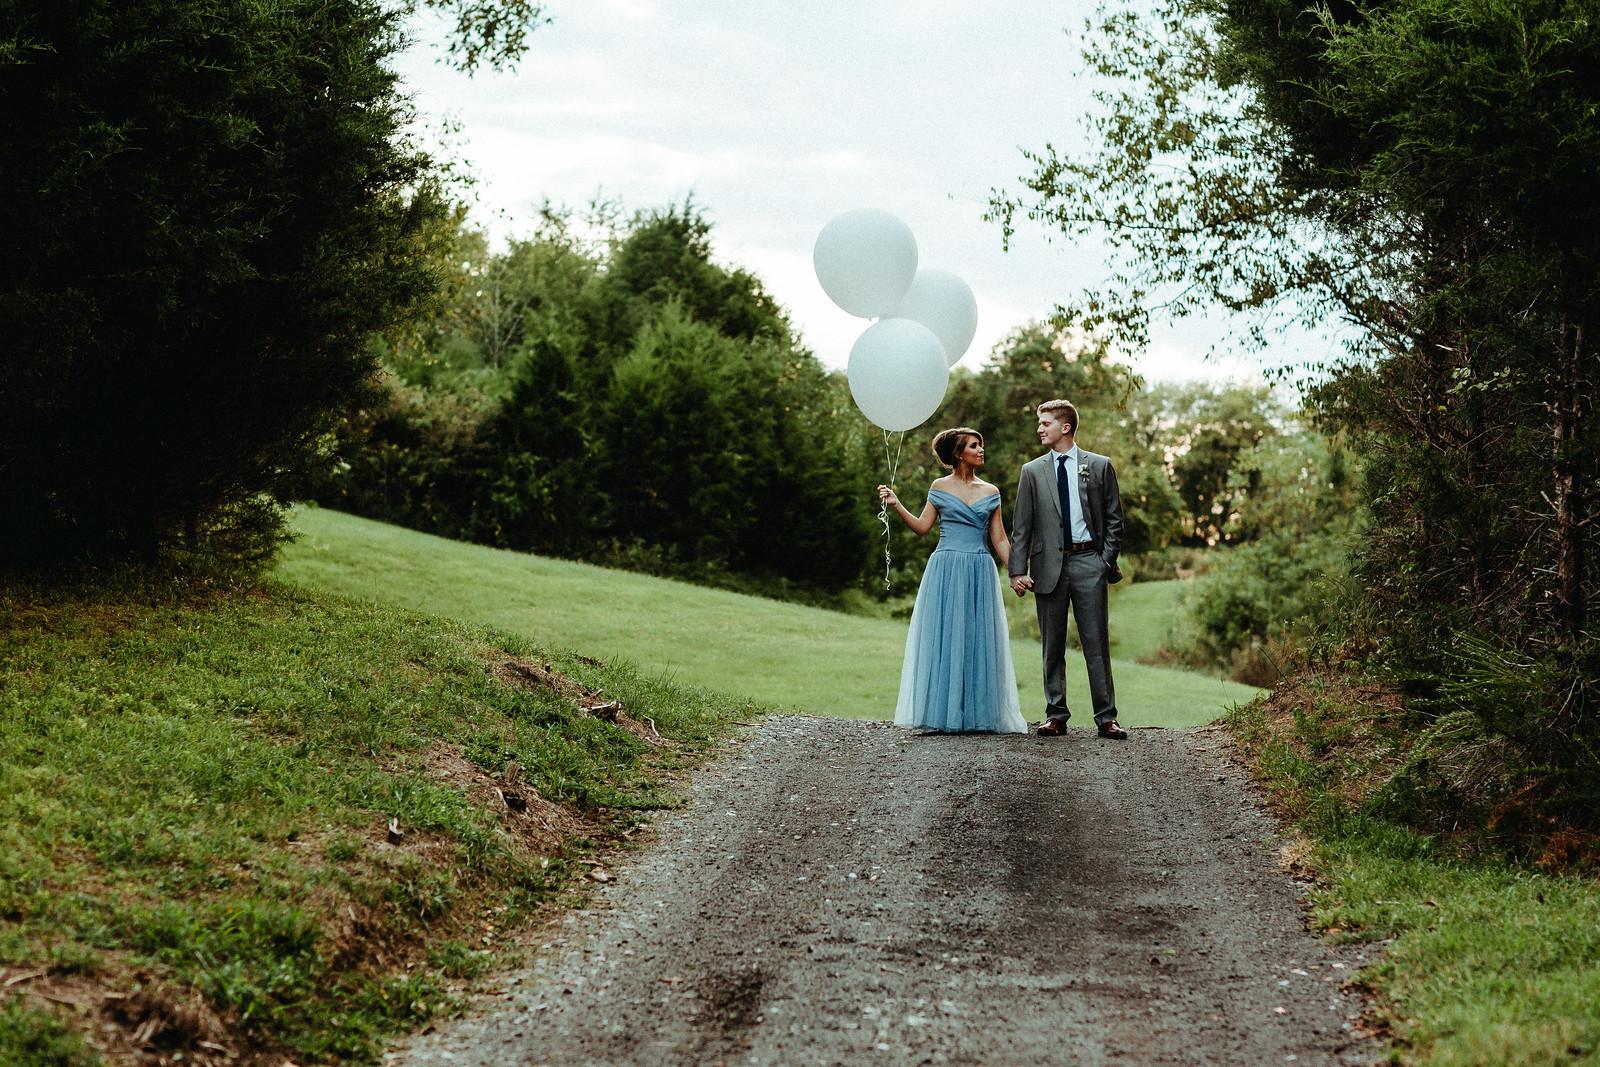 balloons on dirt road.jpg